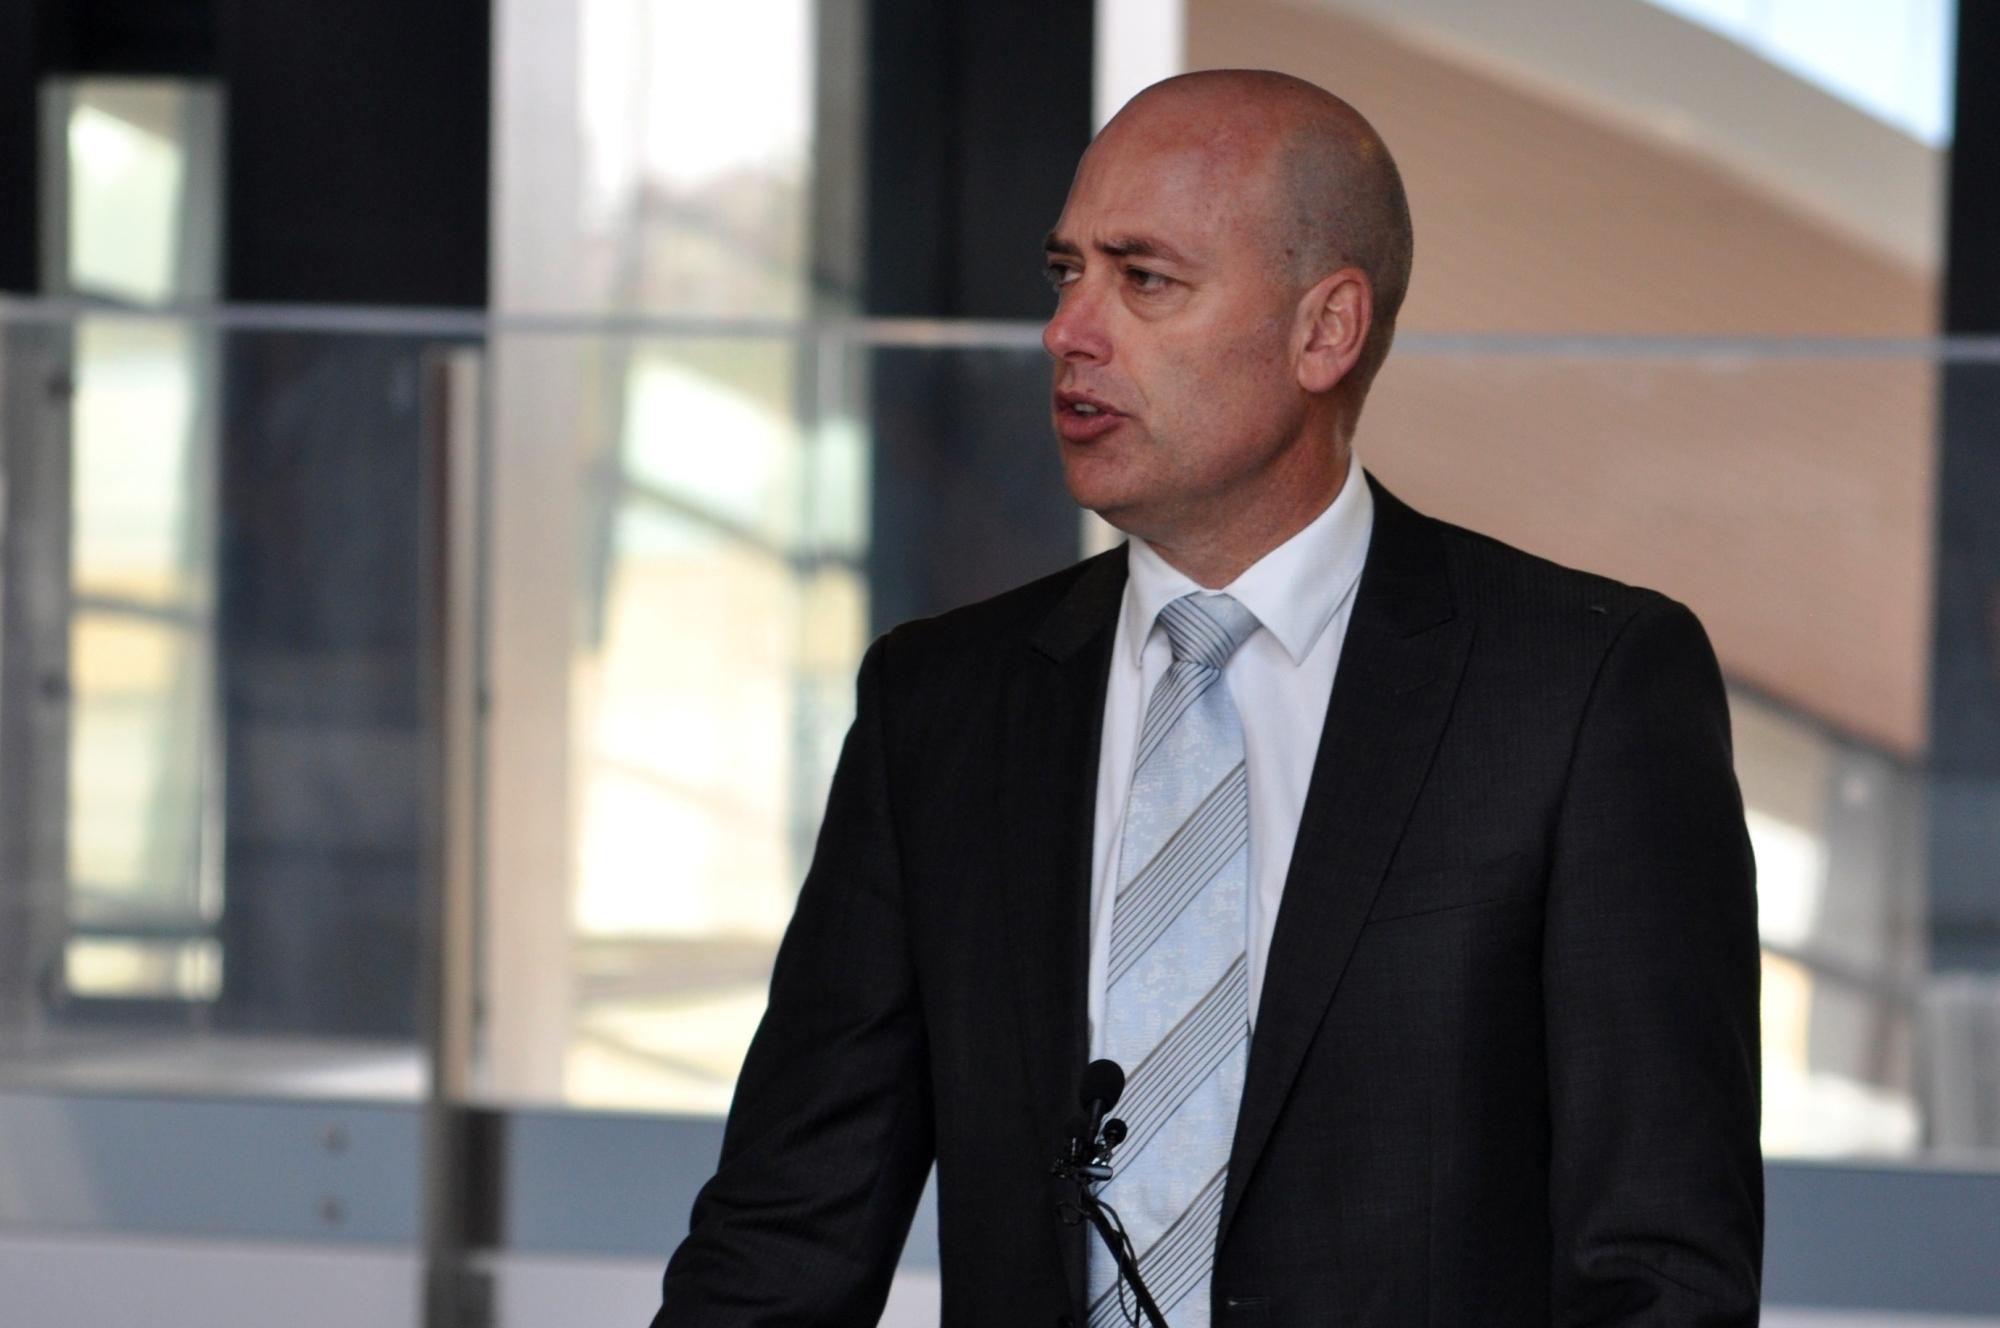 Dean Nalder delivered the blueprint for Perth's transport future last Friday.